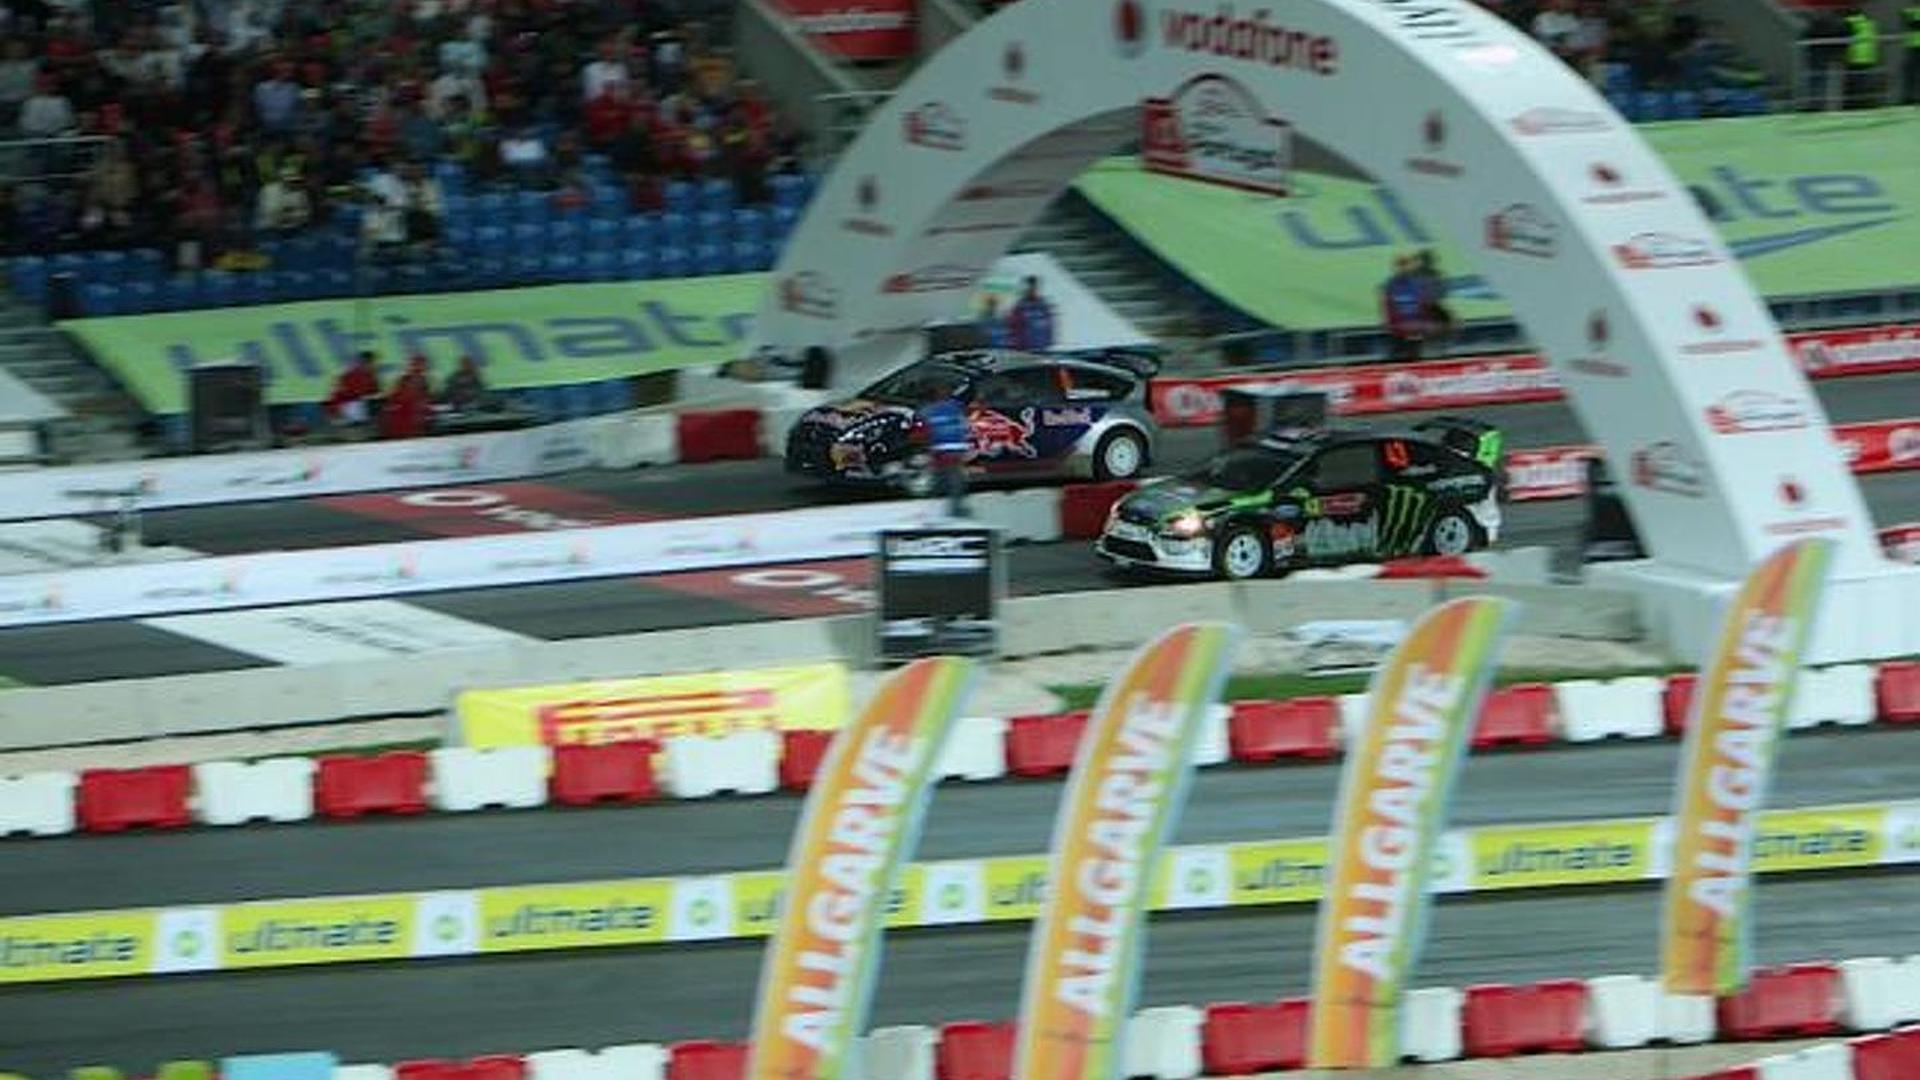 Ken Block vs. Kimi Raikkonen showdown ends with photo finish [Video]